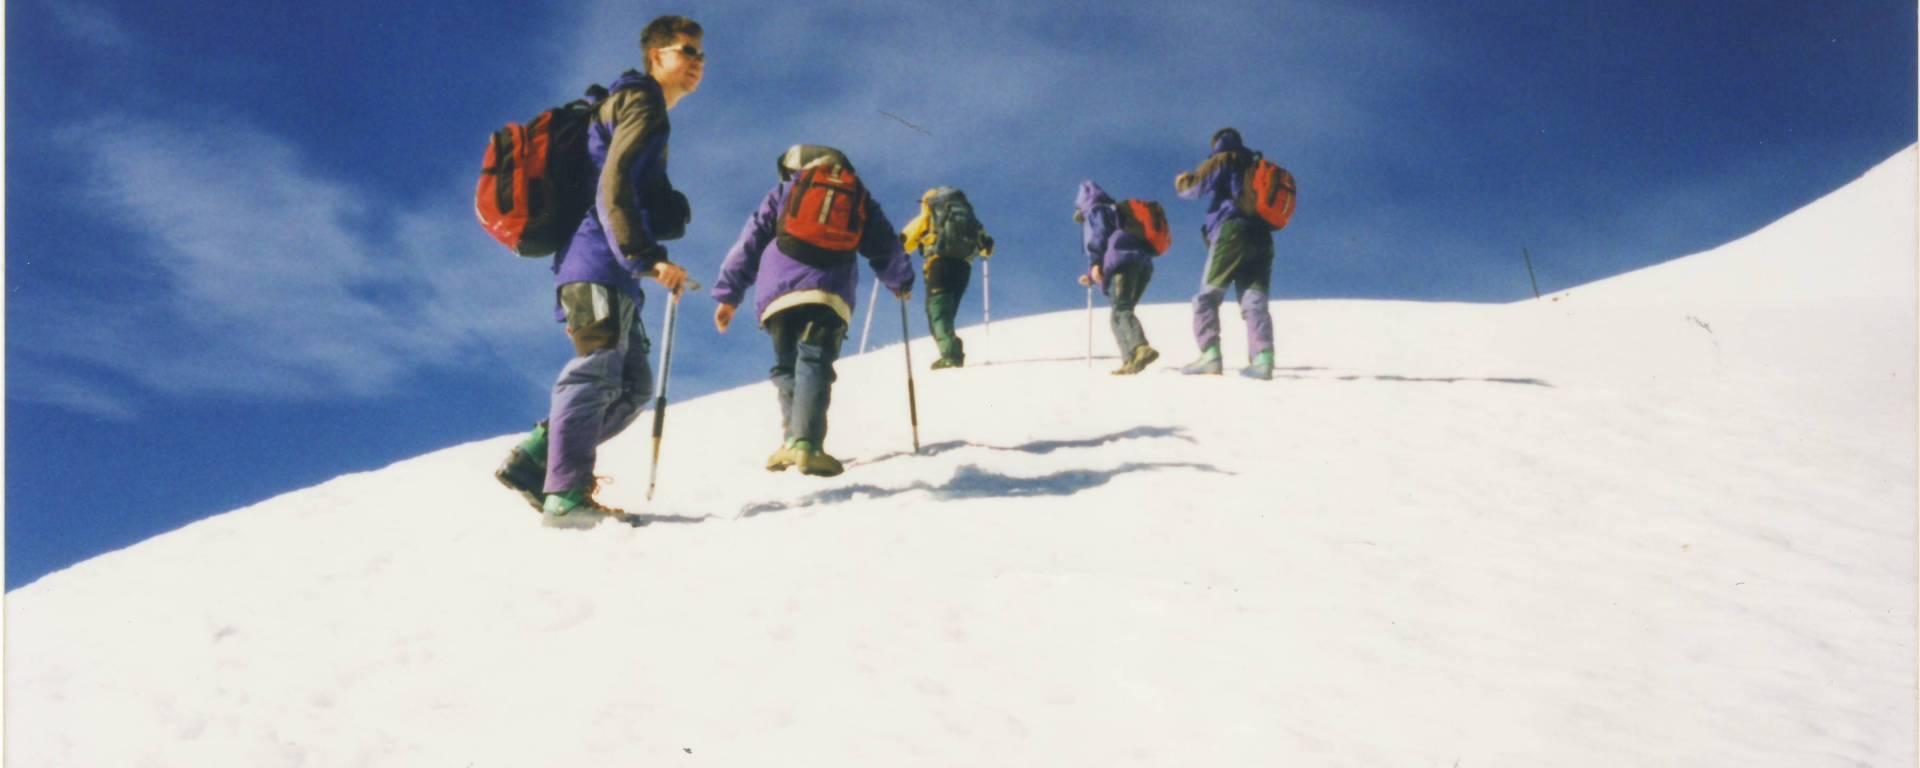 Subida para o Vulcao Villarrica - Chile